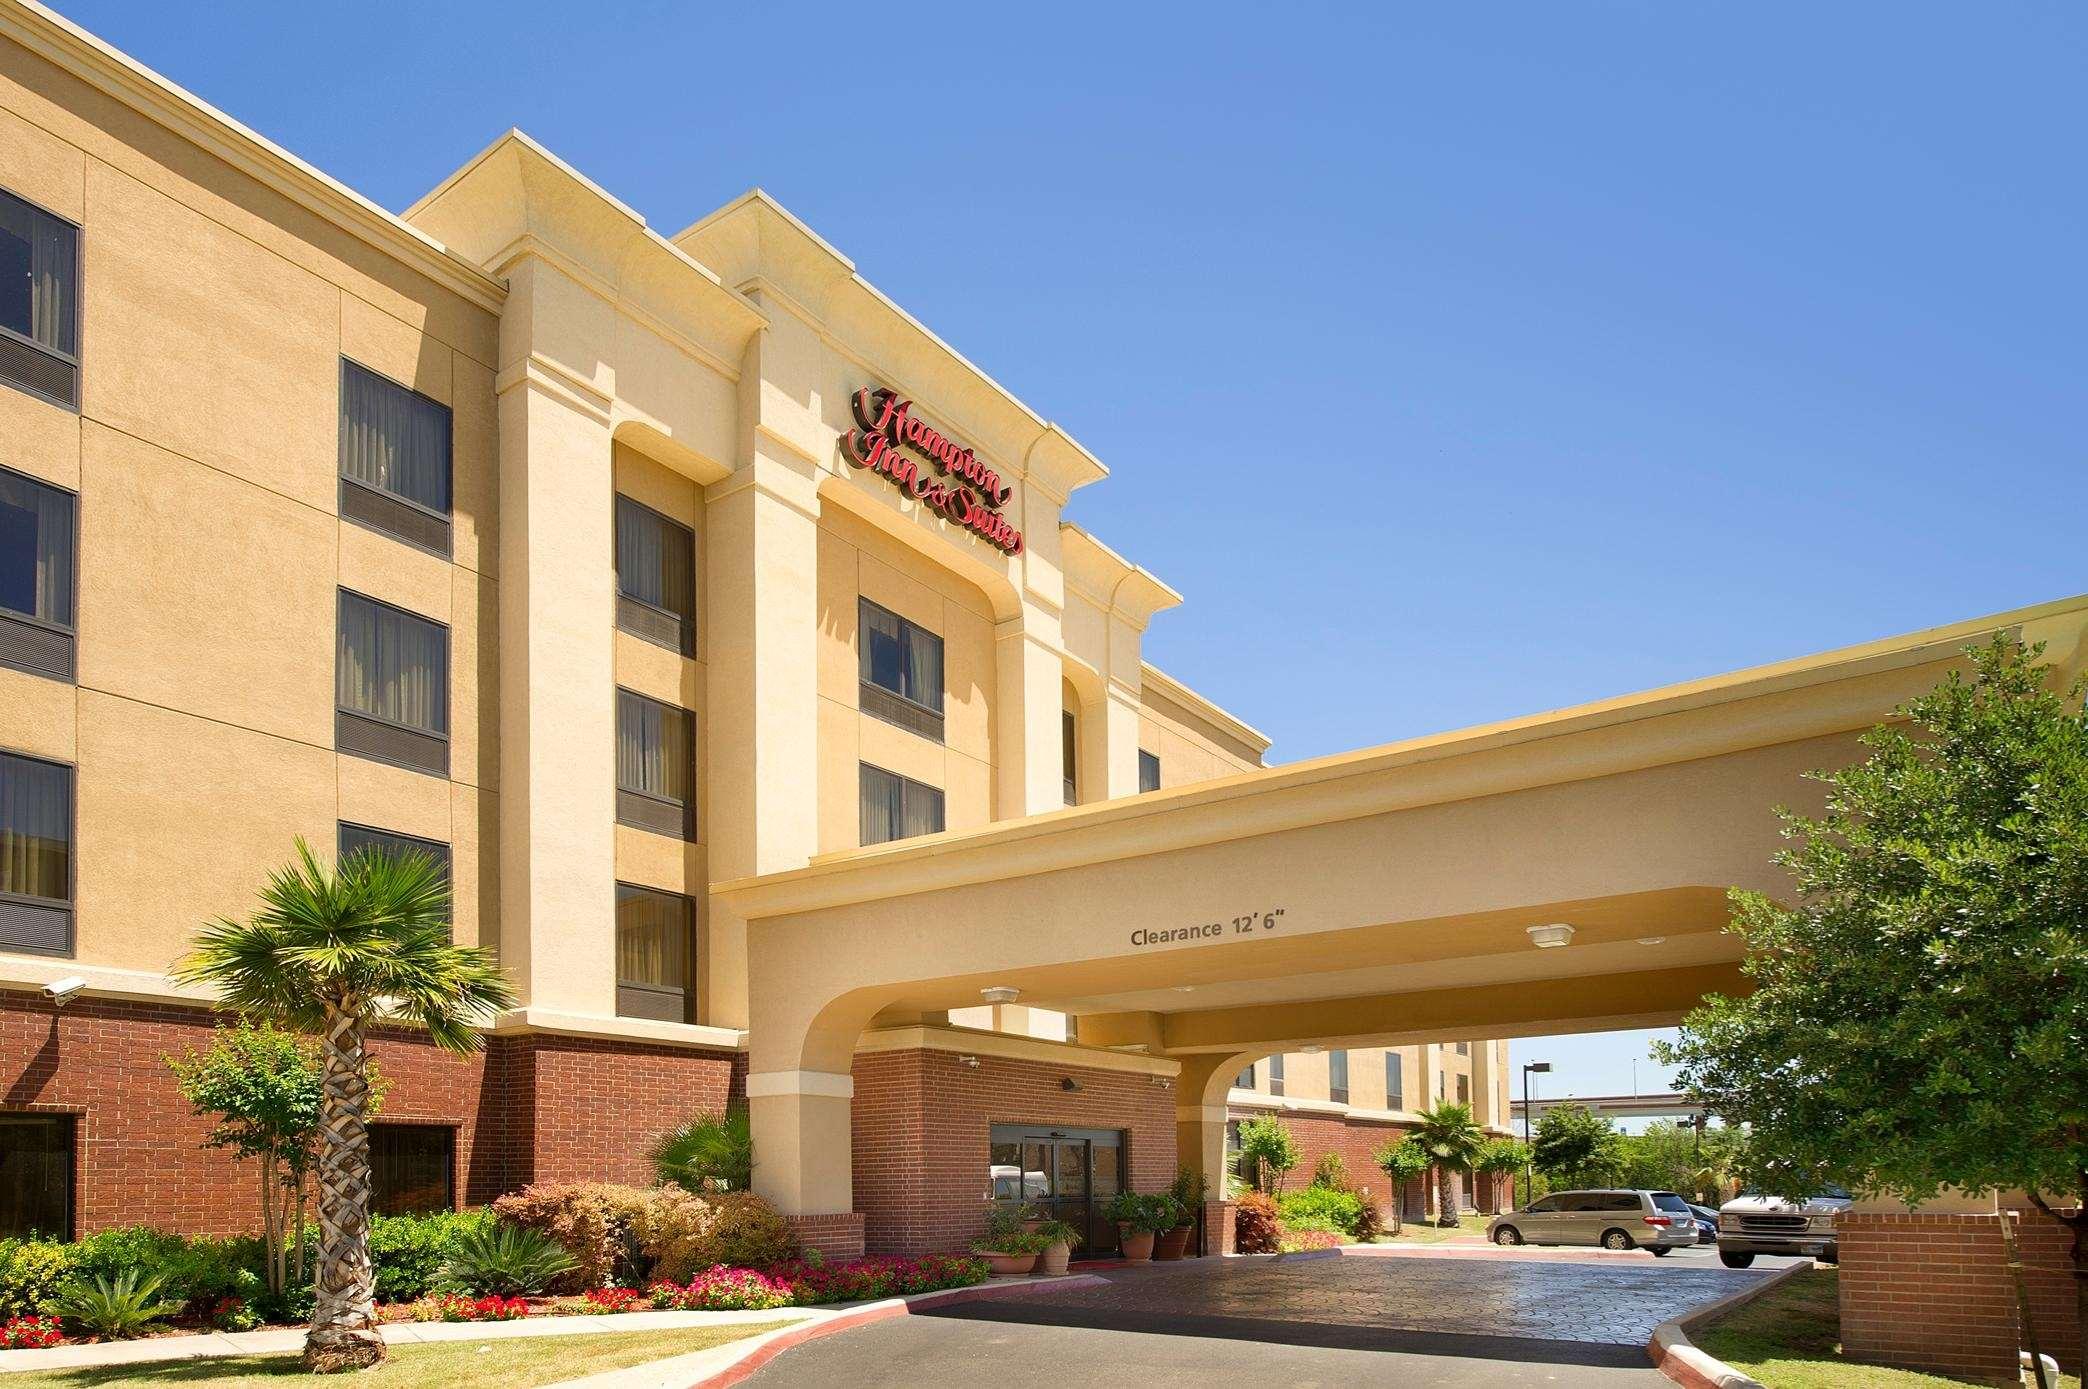 Hampton Inn & Suites San Antonio-Airport image 18